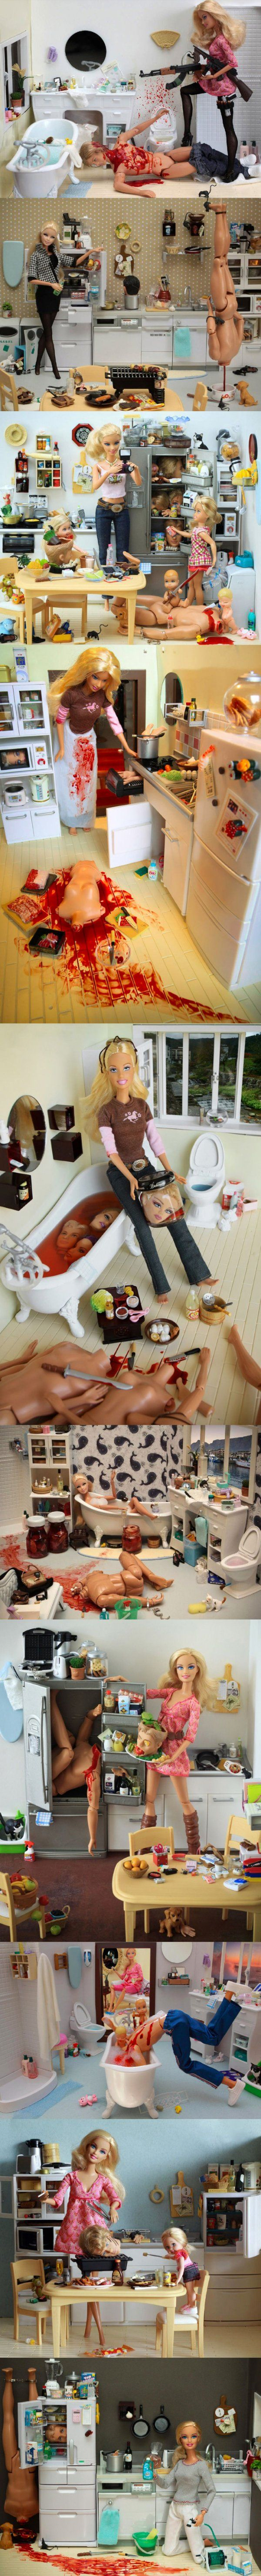 Serial Killer Barbie.  Awesome.